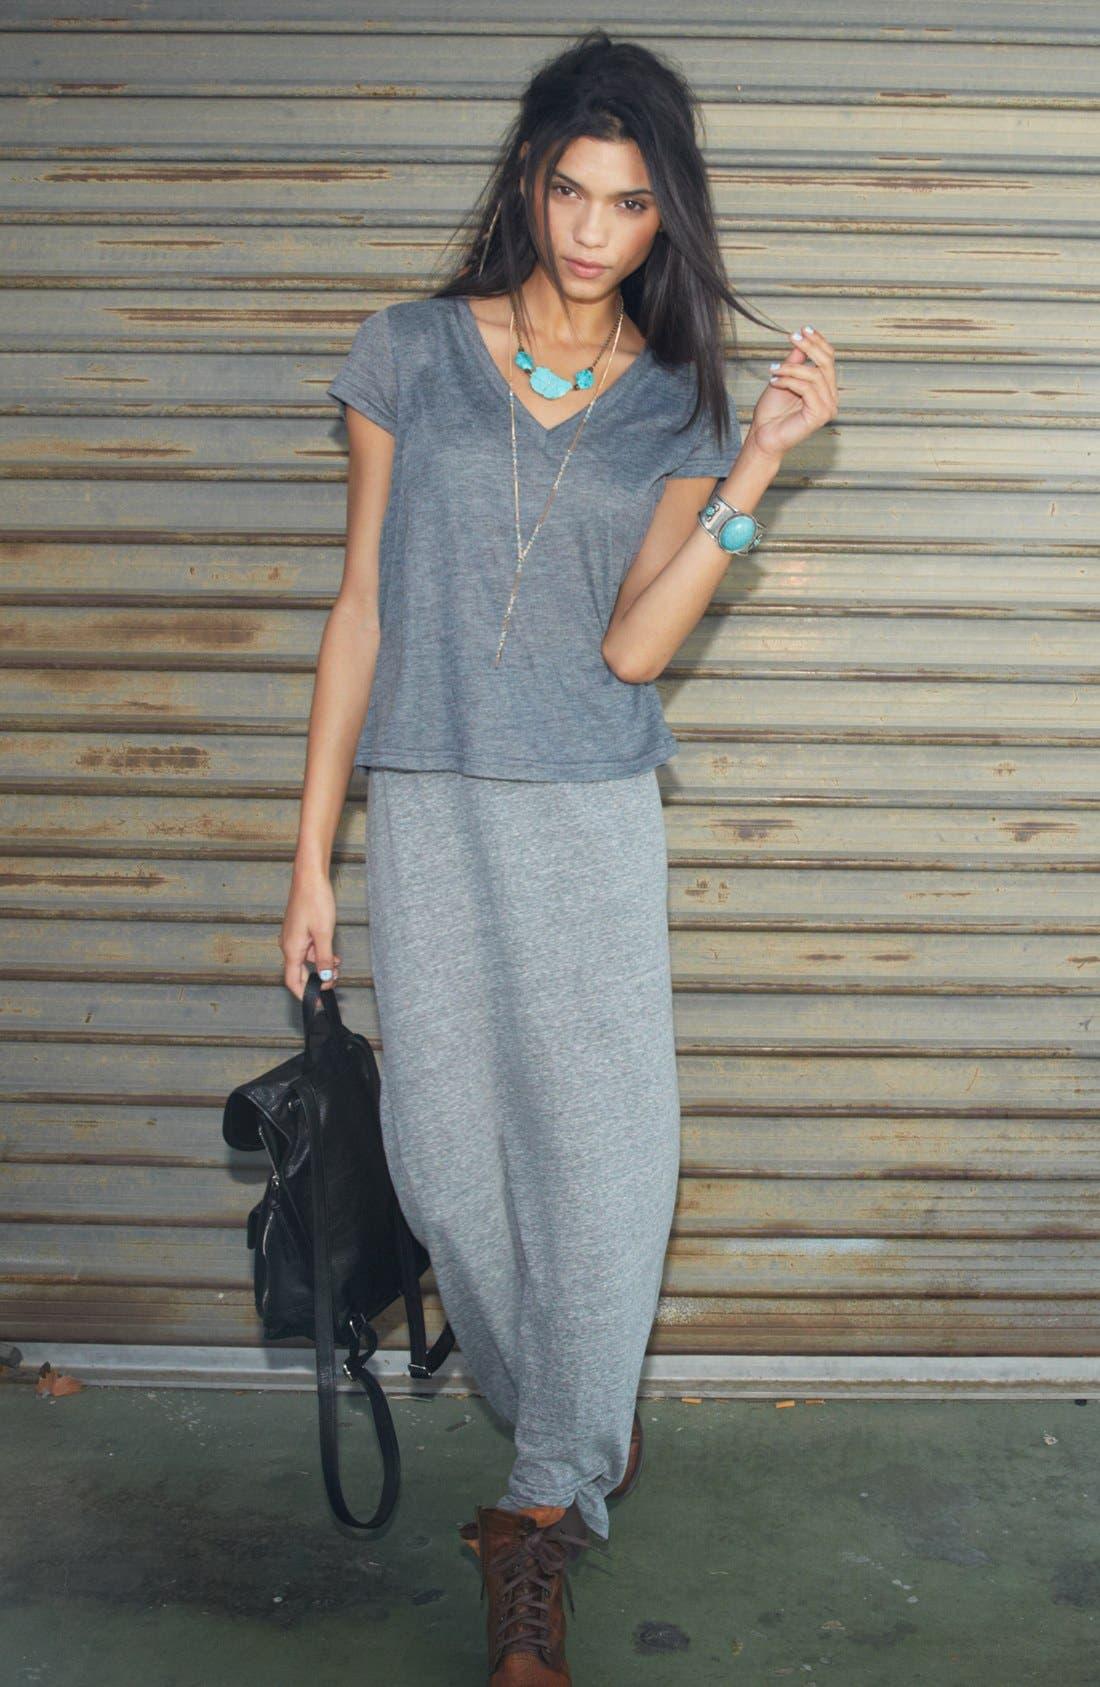 Main Image - BP. Tee, h.i.p. Maxi Skirt & Accessories